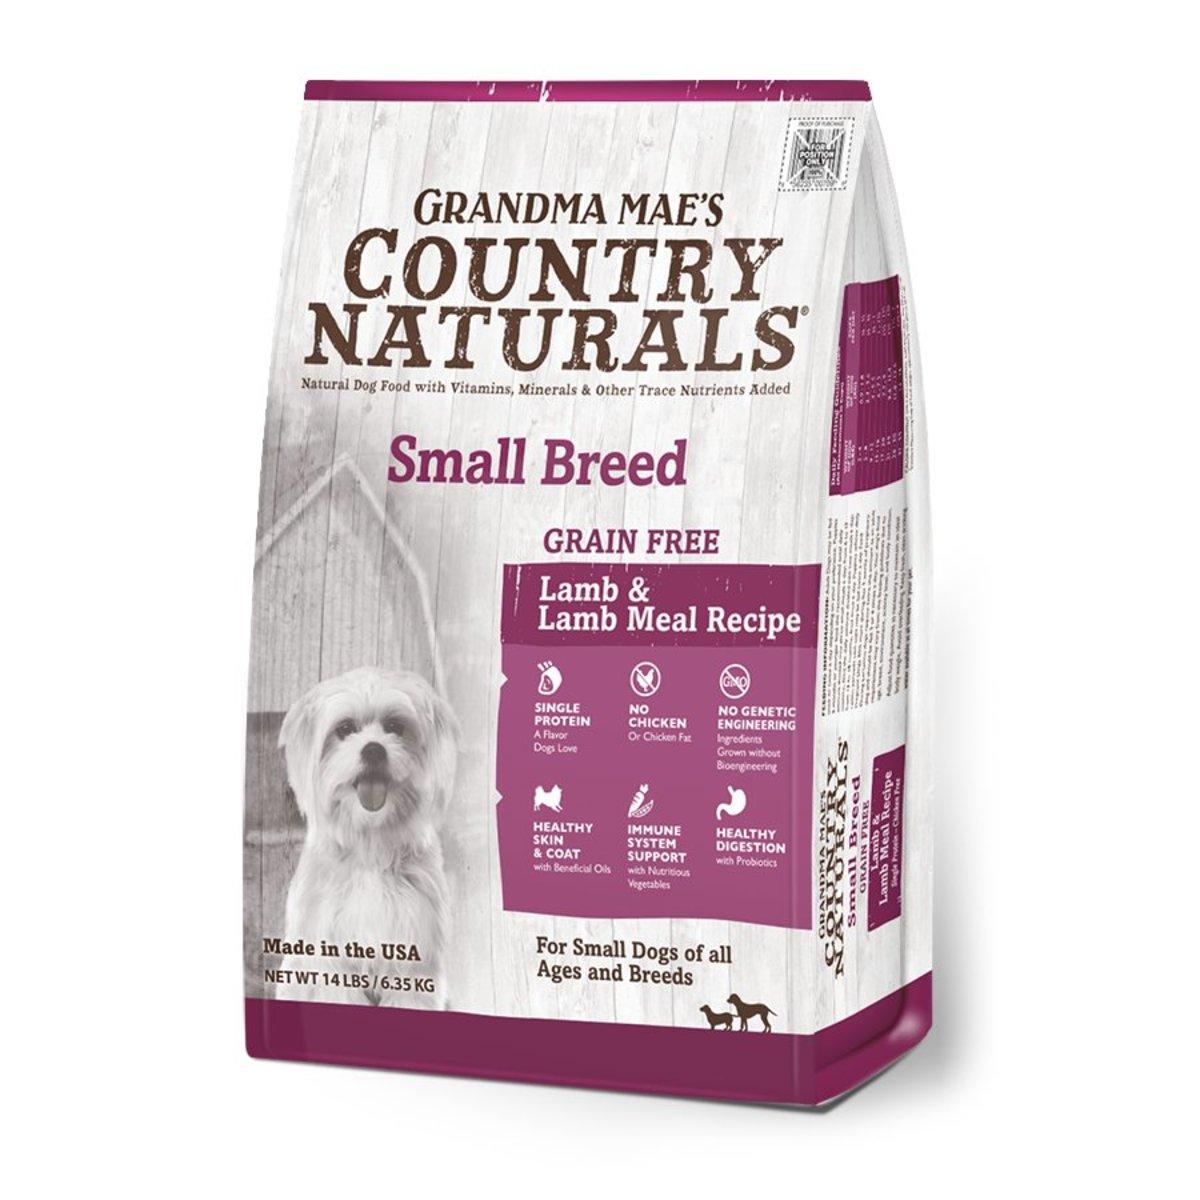 Grain Free Lamb & Lamb Meal Recipe Small Breed Dry Dog Food 4lb